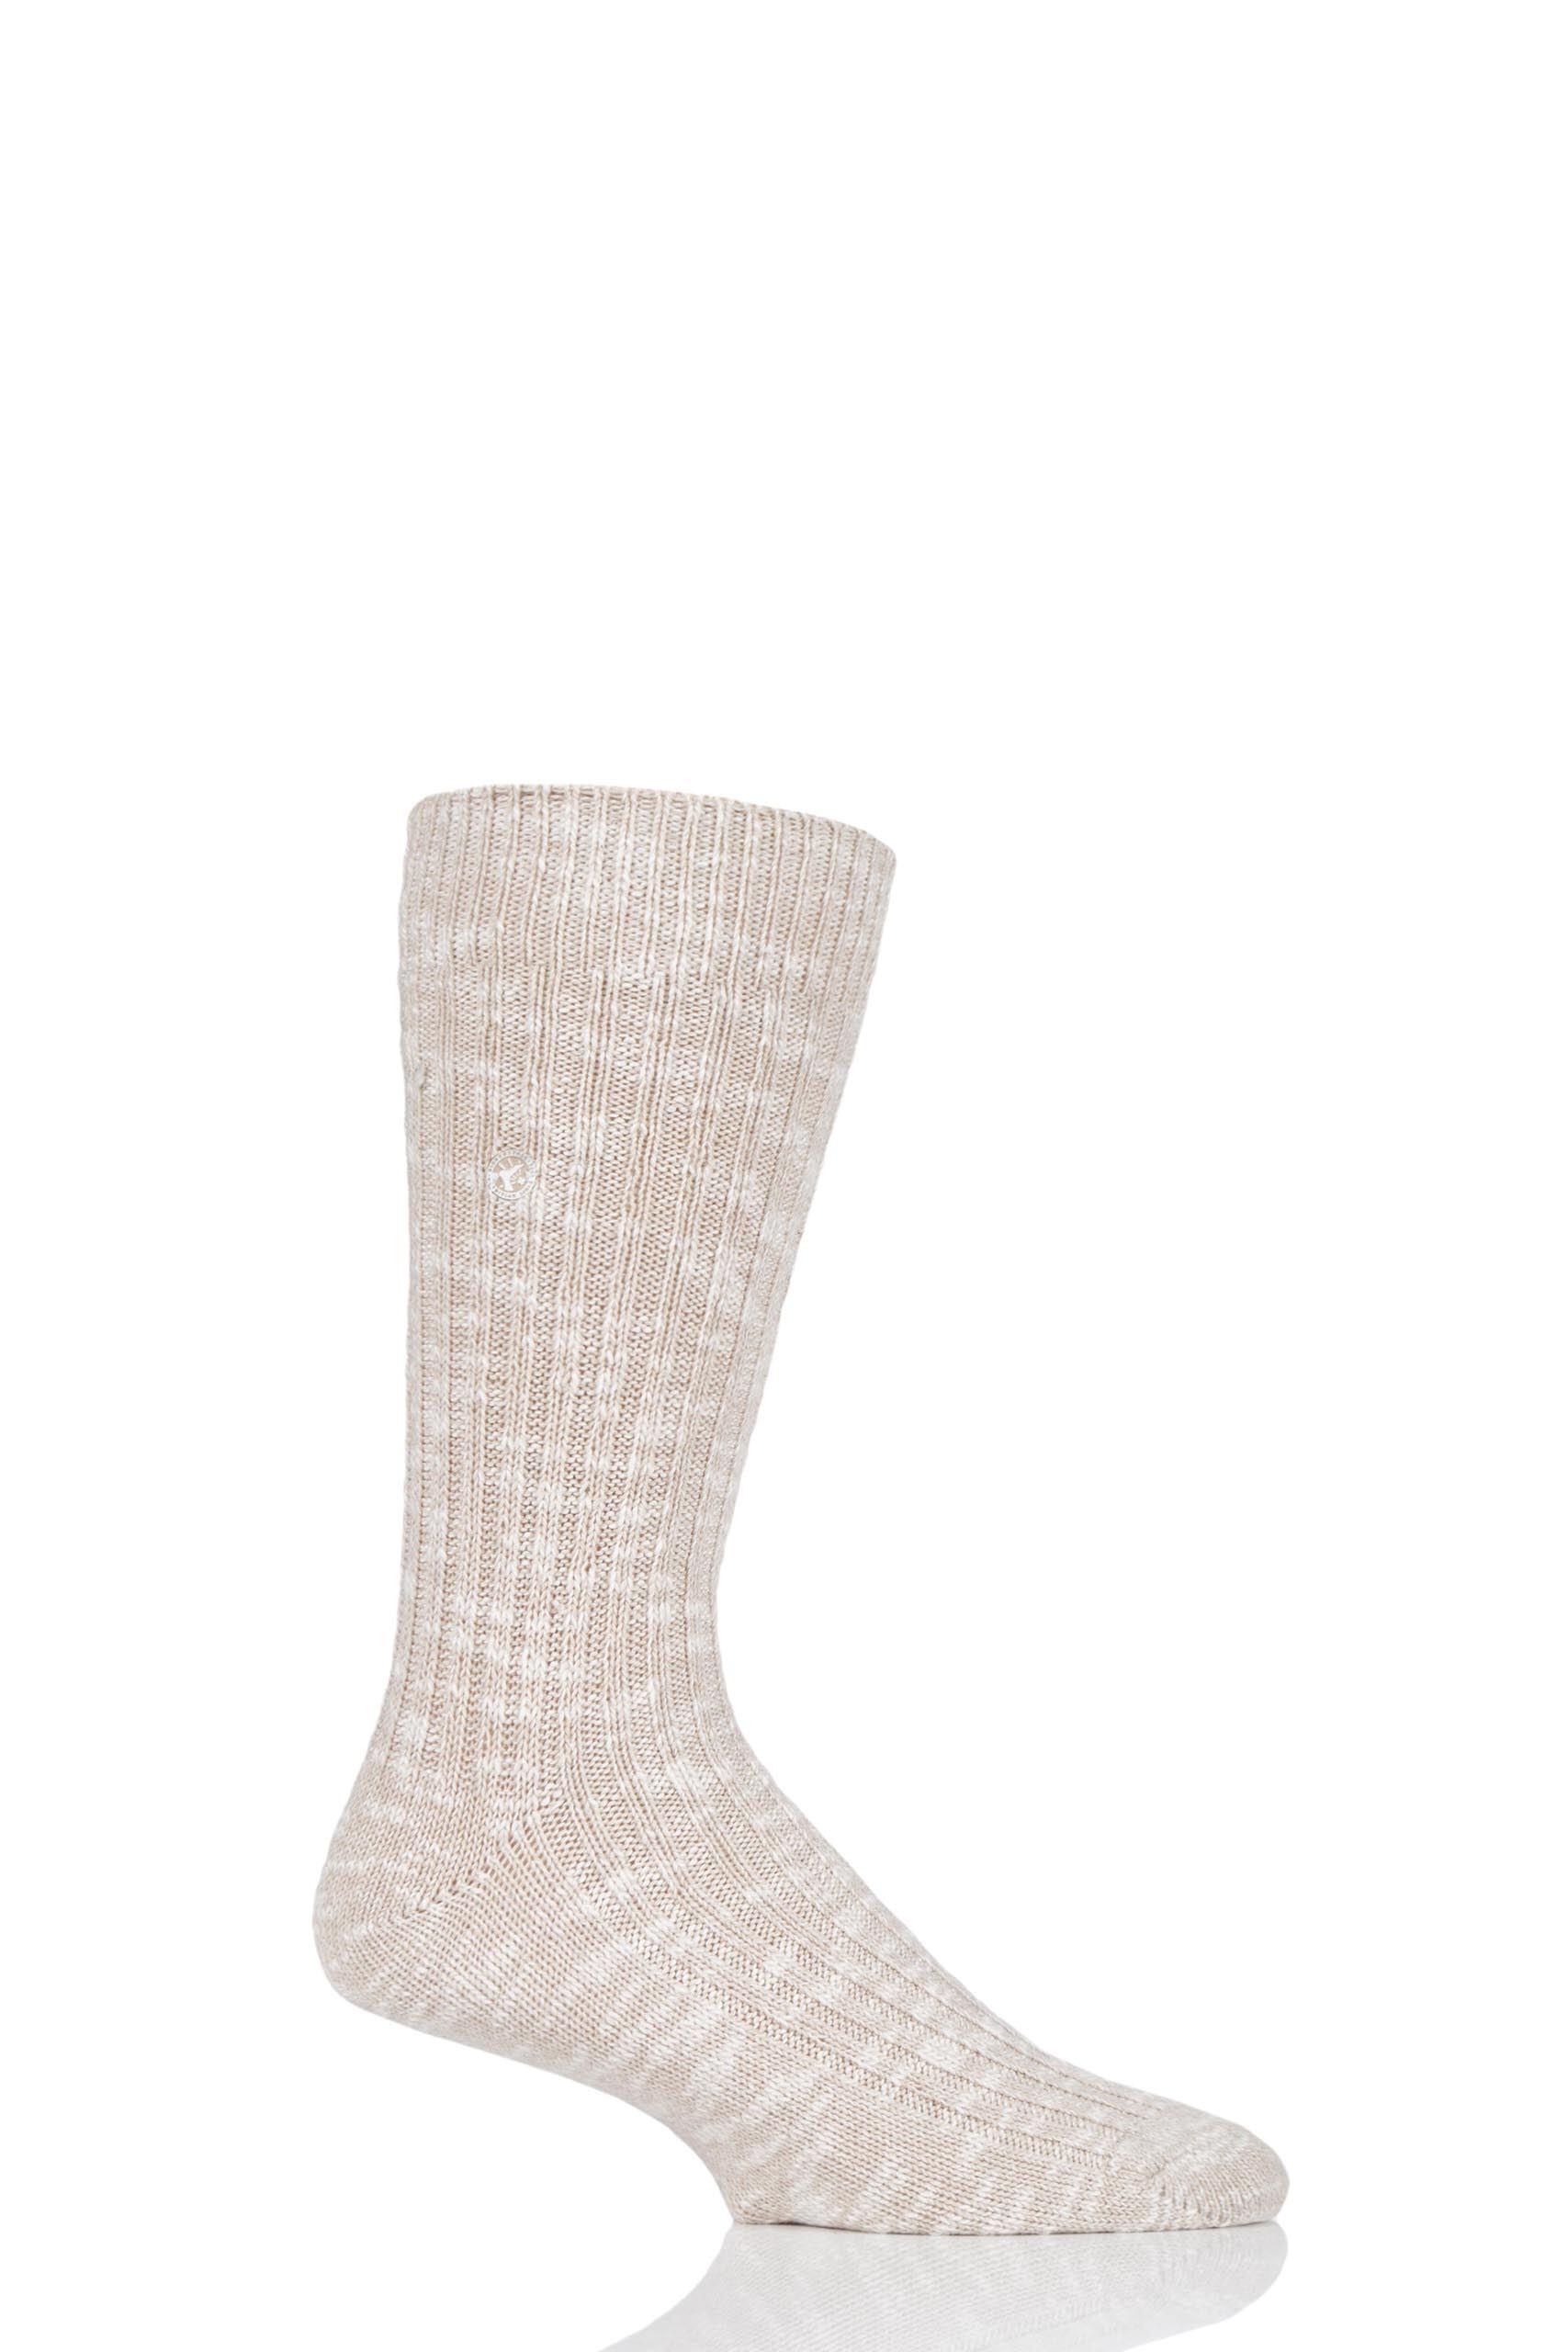 Image of 1 Pair Beige Cotton Slub Thick Ribbed Socks Men's 5.5-7.5 Mens - Birkenstock